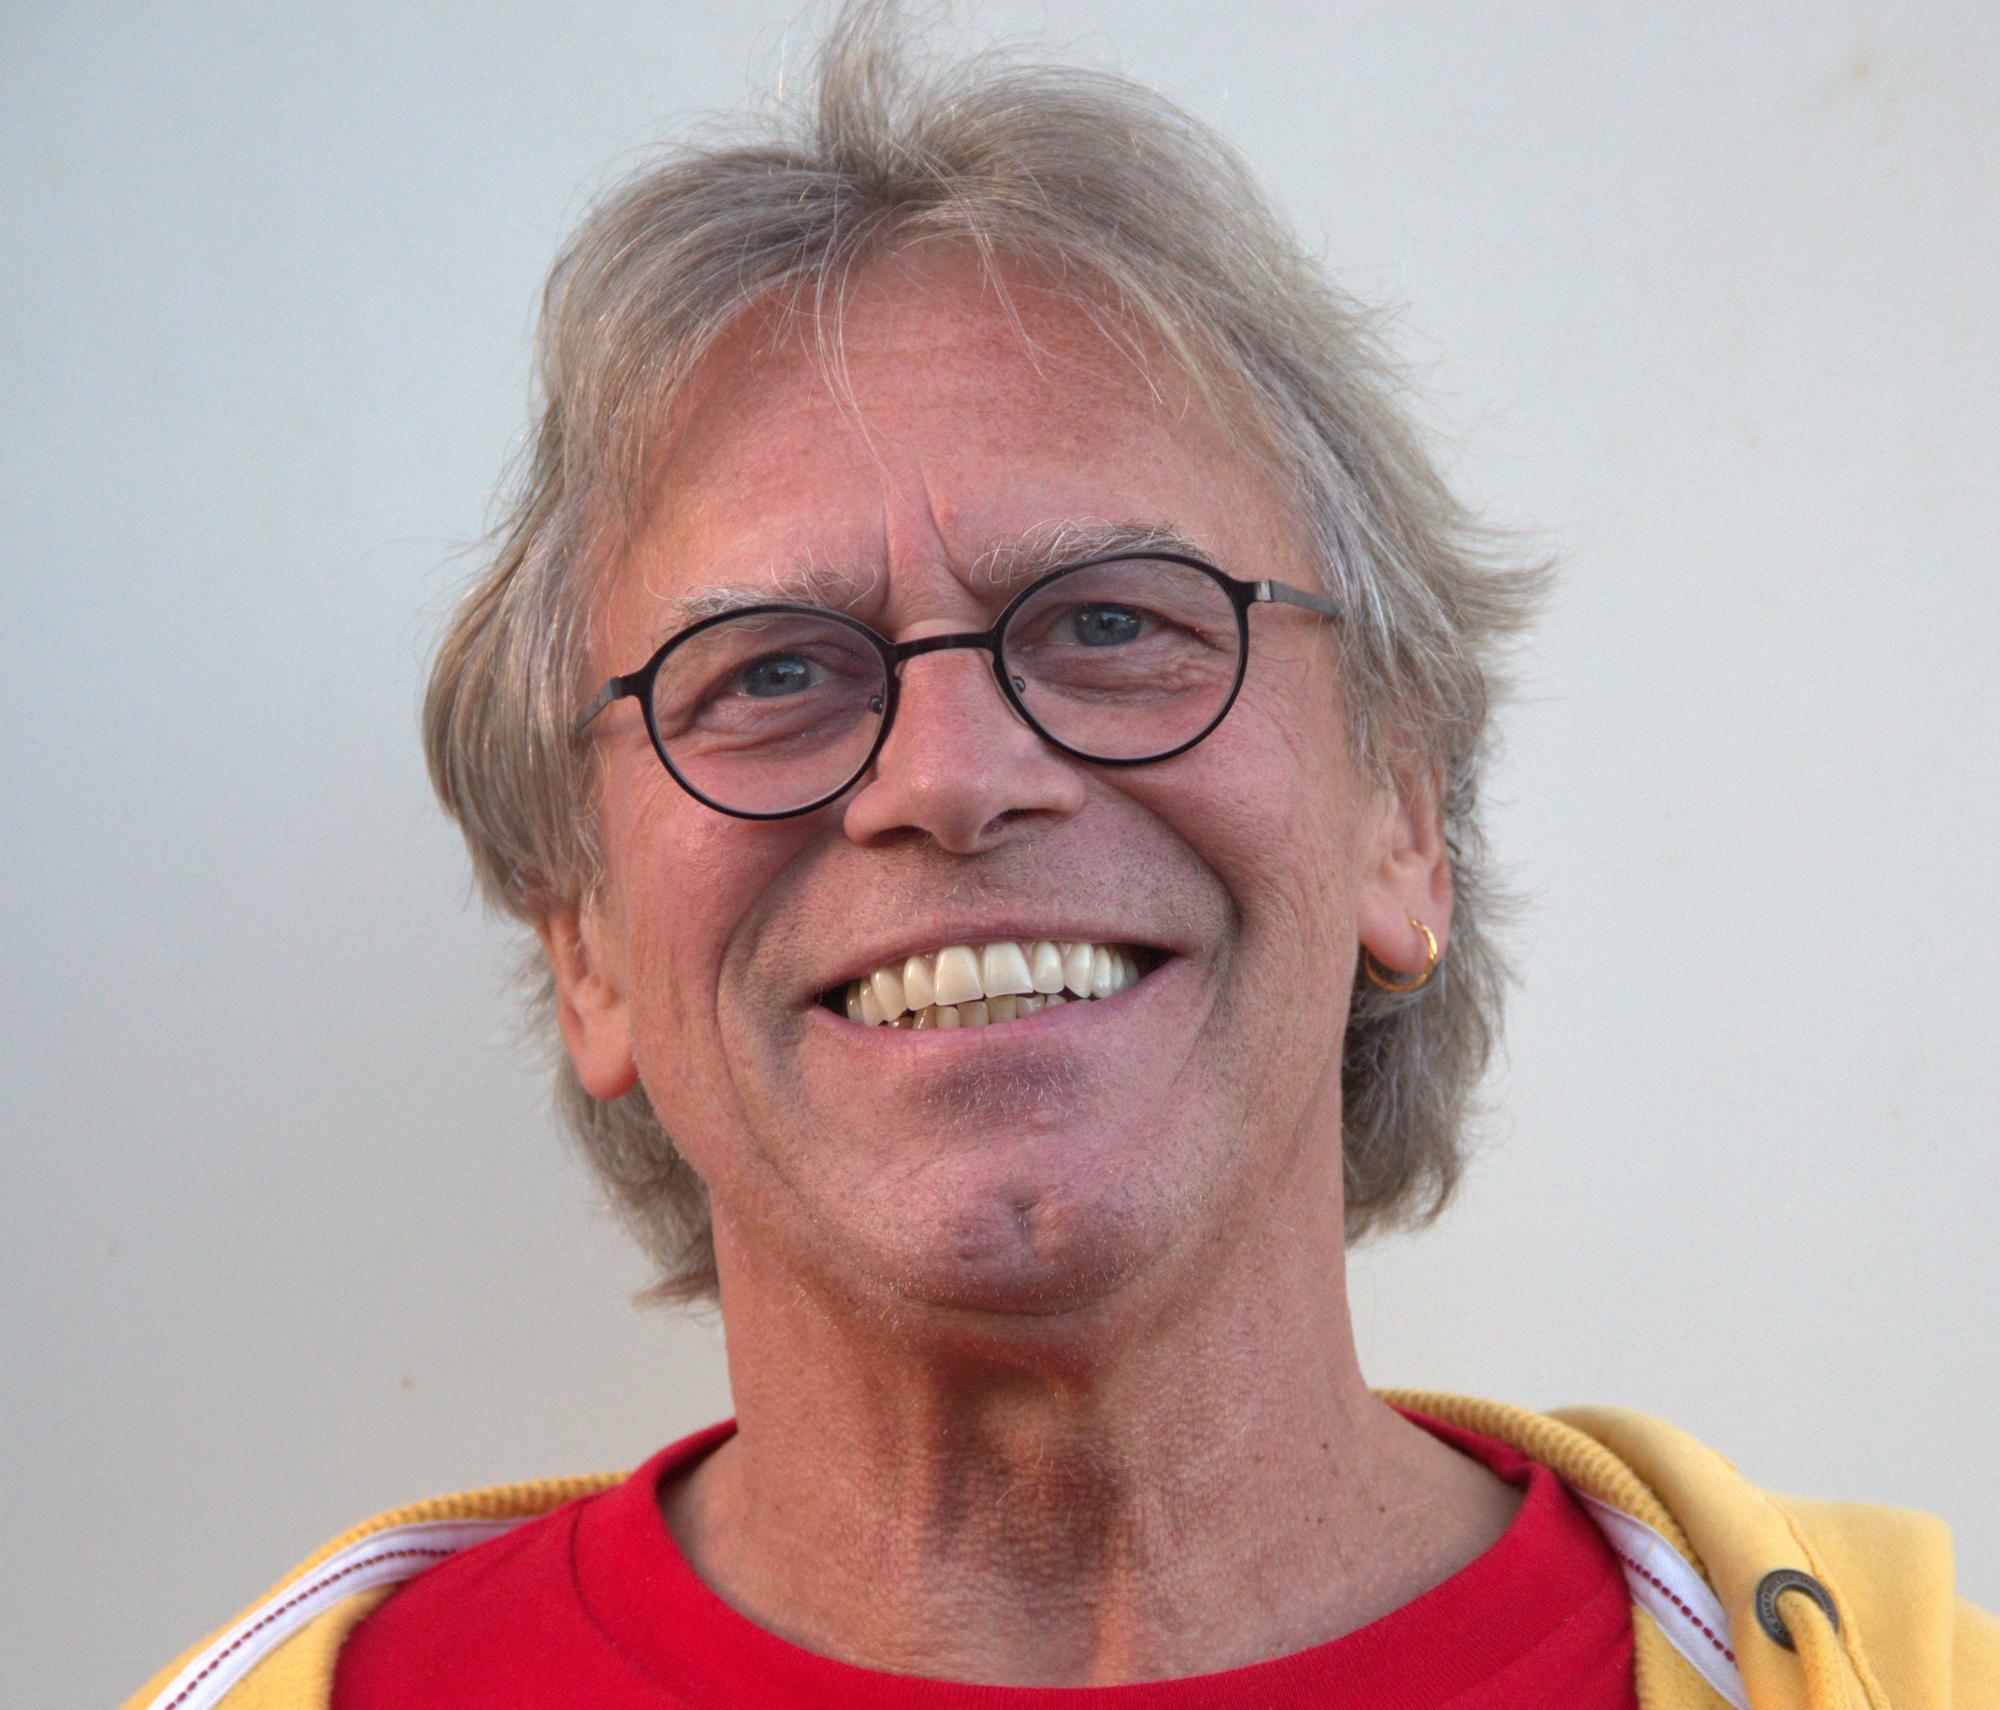 Heino Ršöhr